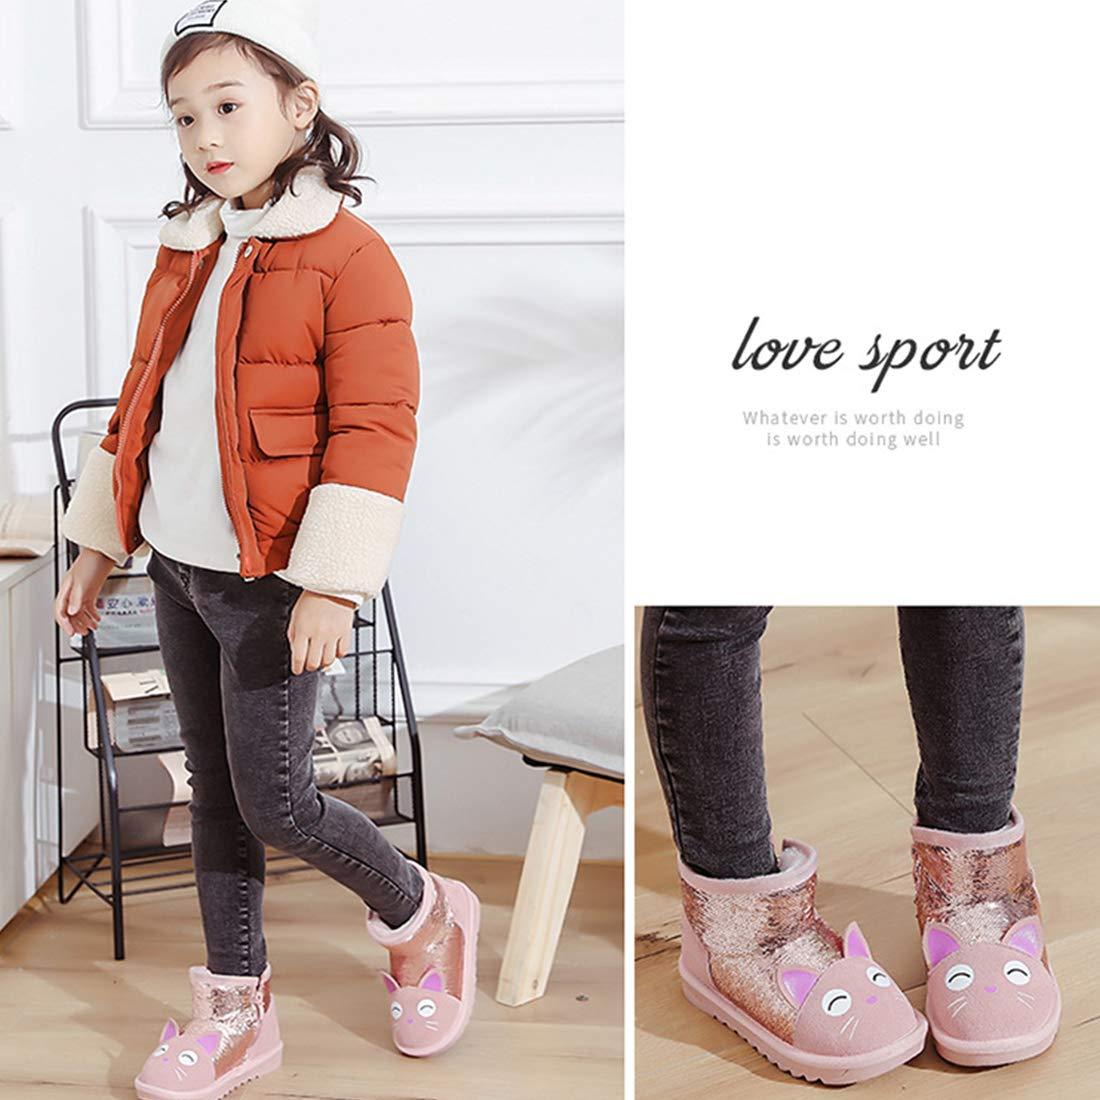 Toddler//Little Kids Baby Kids Boys Girls Winter Warm Fur Ling Slip-on Boots Shoes